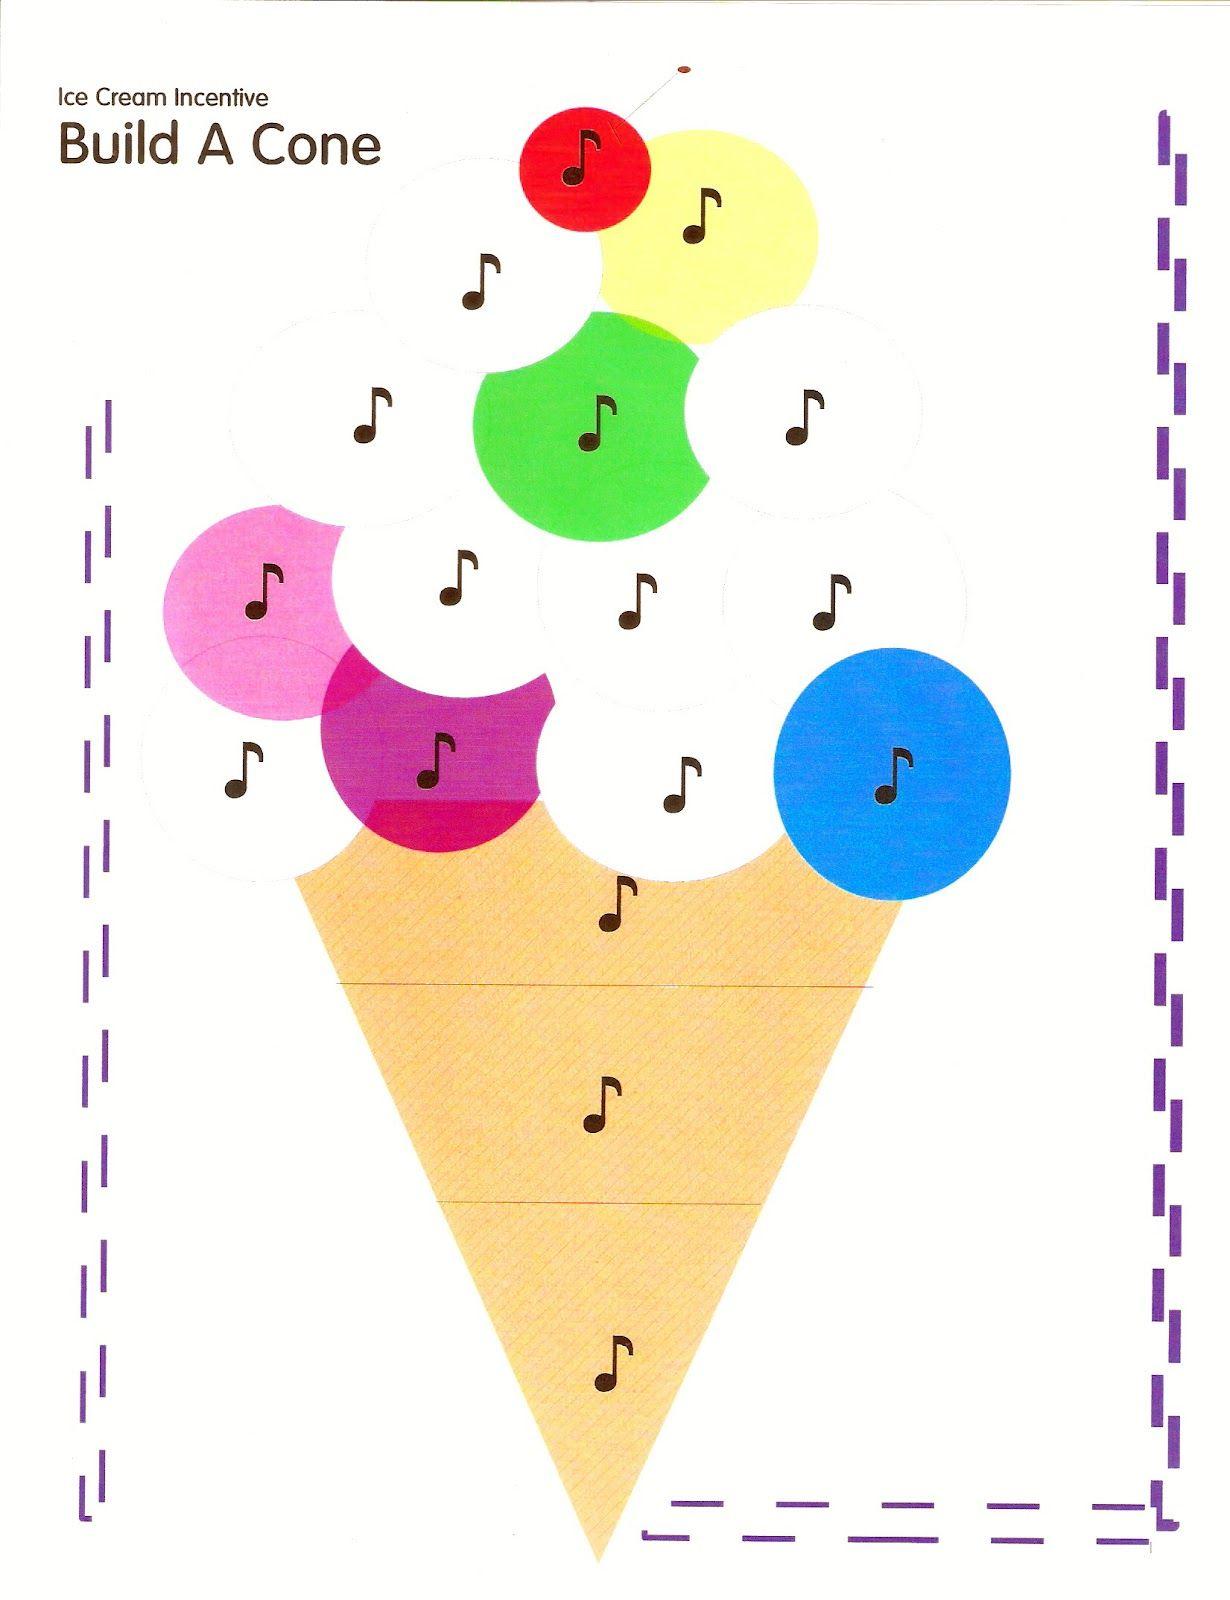 Piano Teaching Ice Cream Incentive